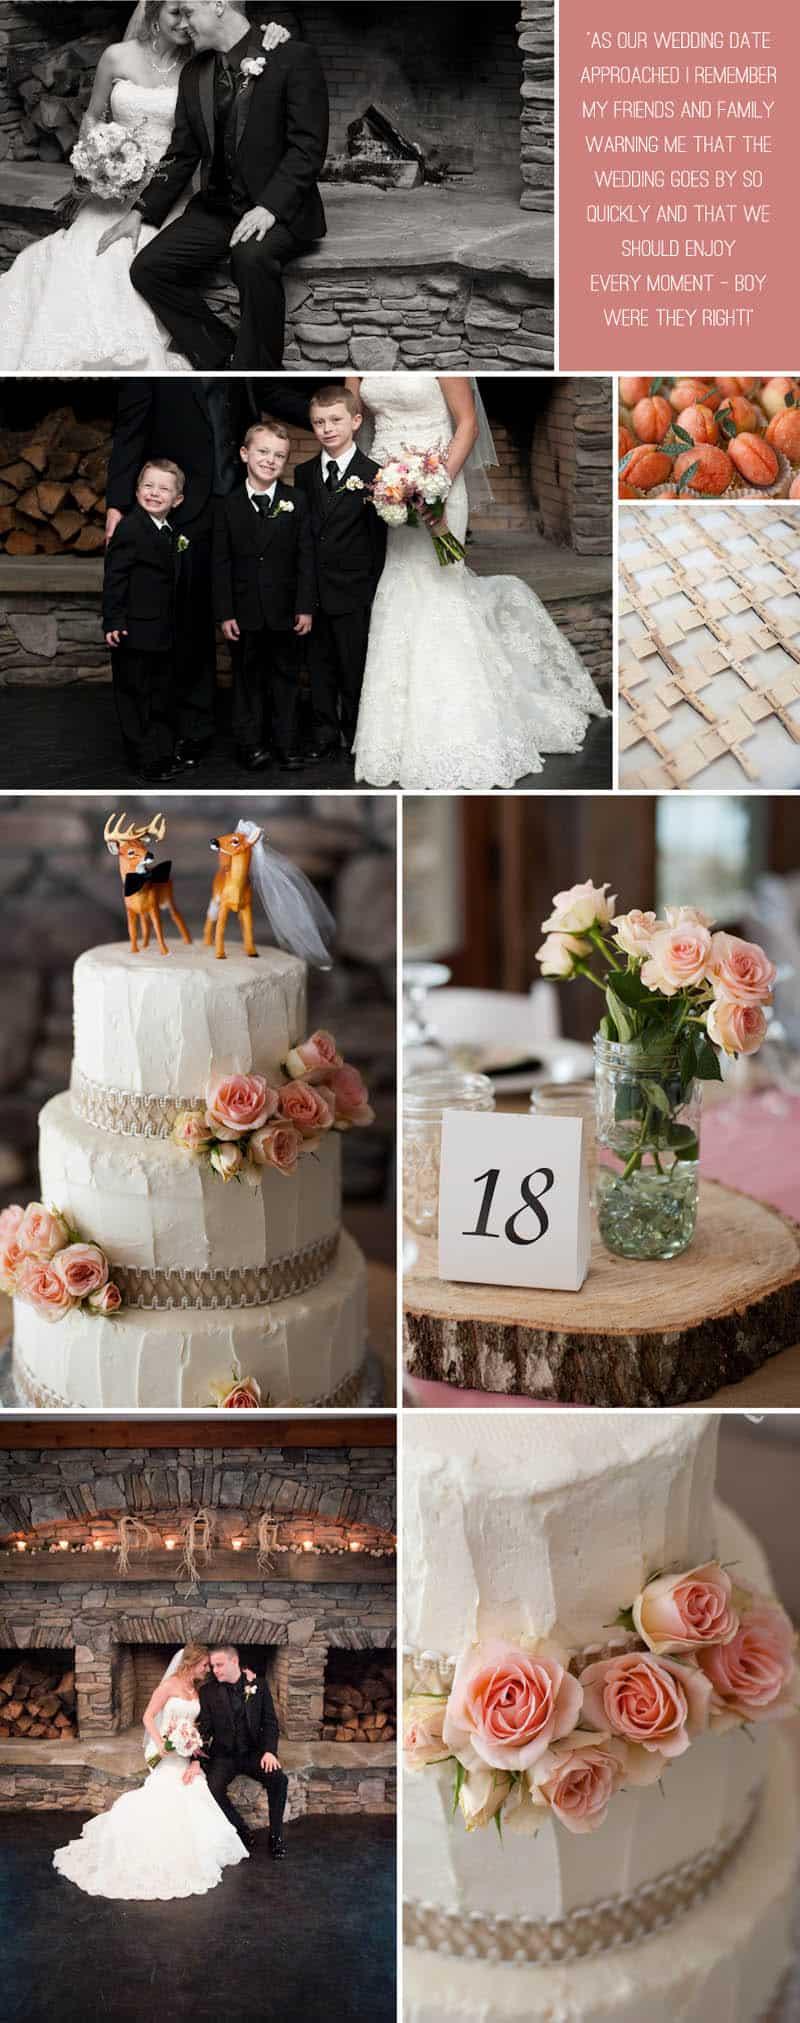 A Rustic Winter Wedding 5